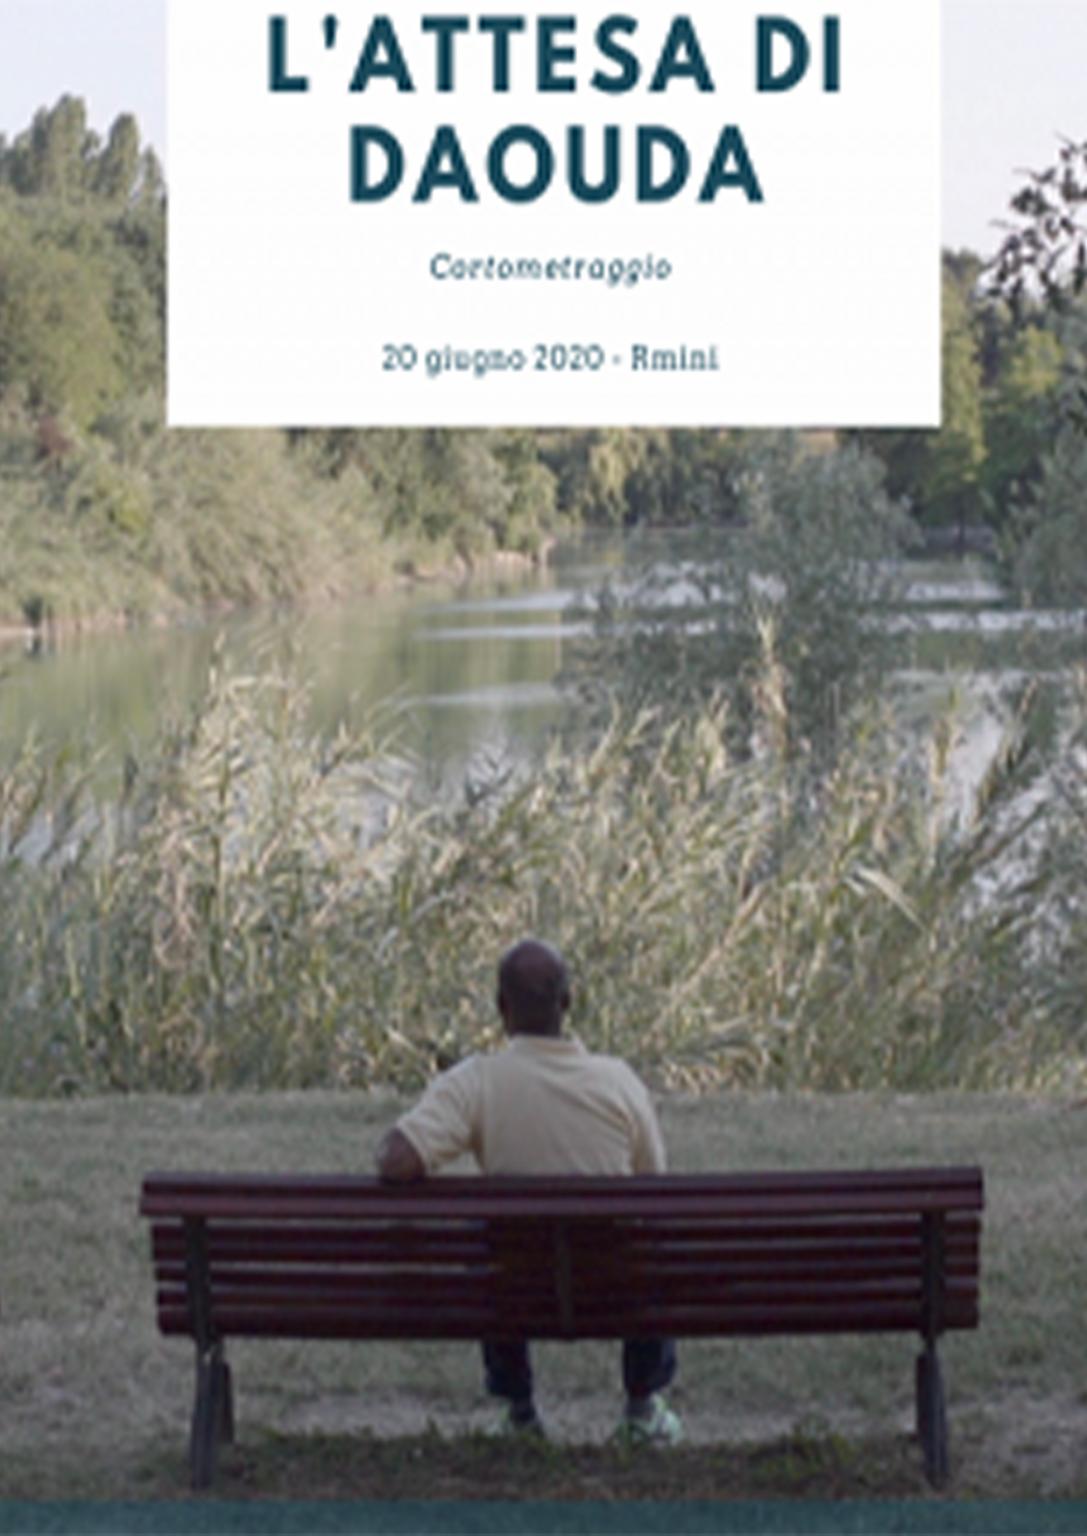 L'attesa di Daouda - Coffeetimefilm